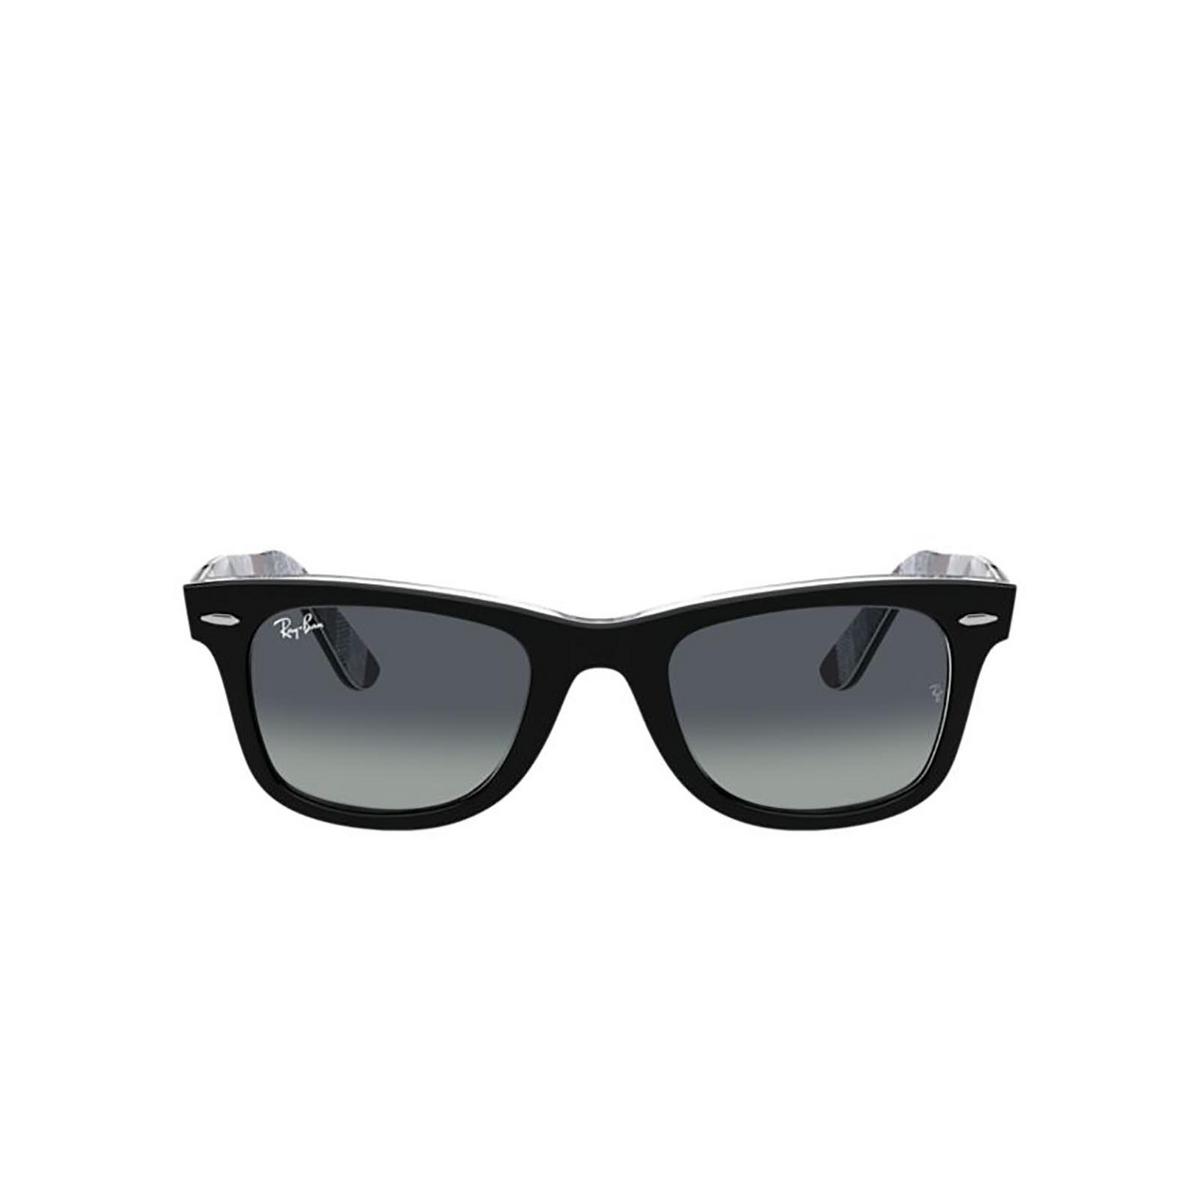 Ray-Ban® Square Sunglasses: Wayfarer RB2140 color Black On Chevron Grey / Burgundy 13183A.